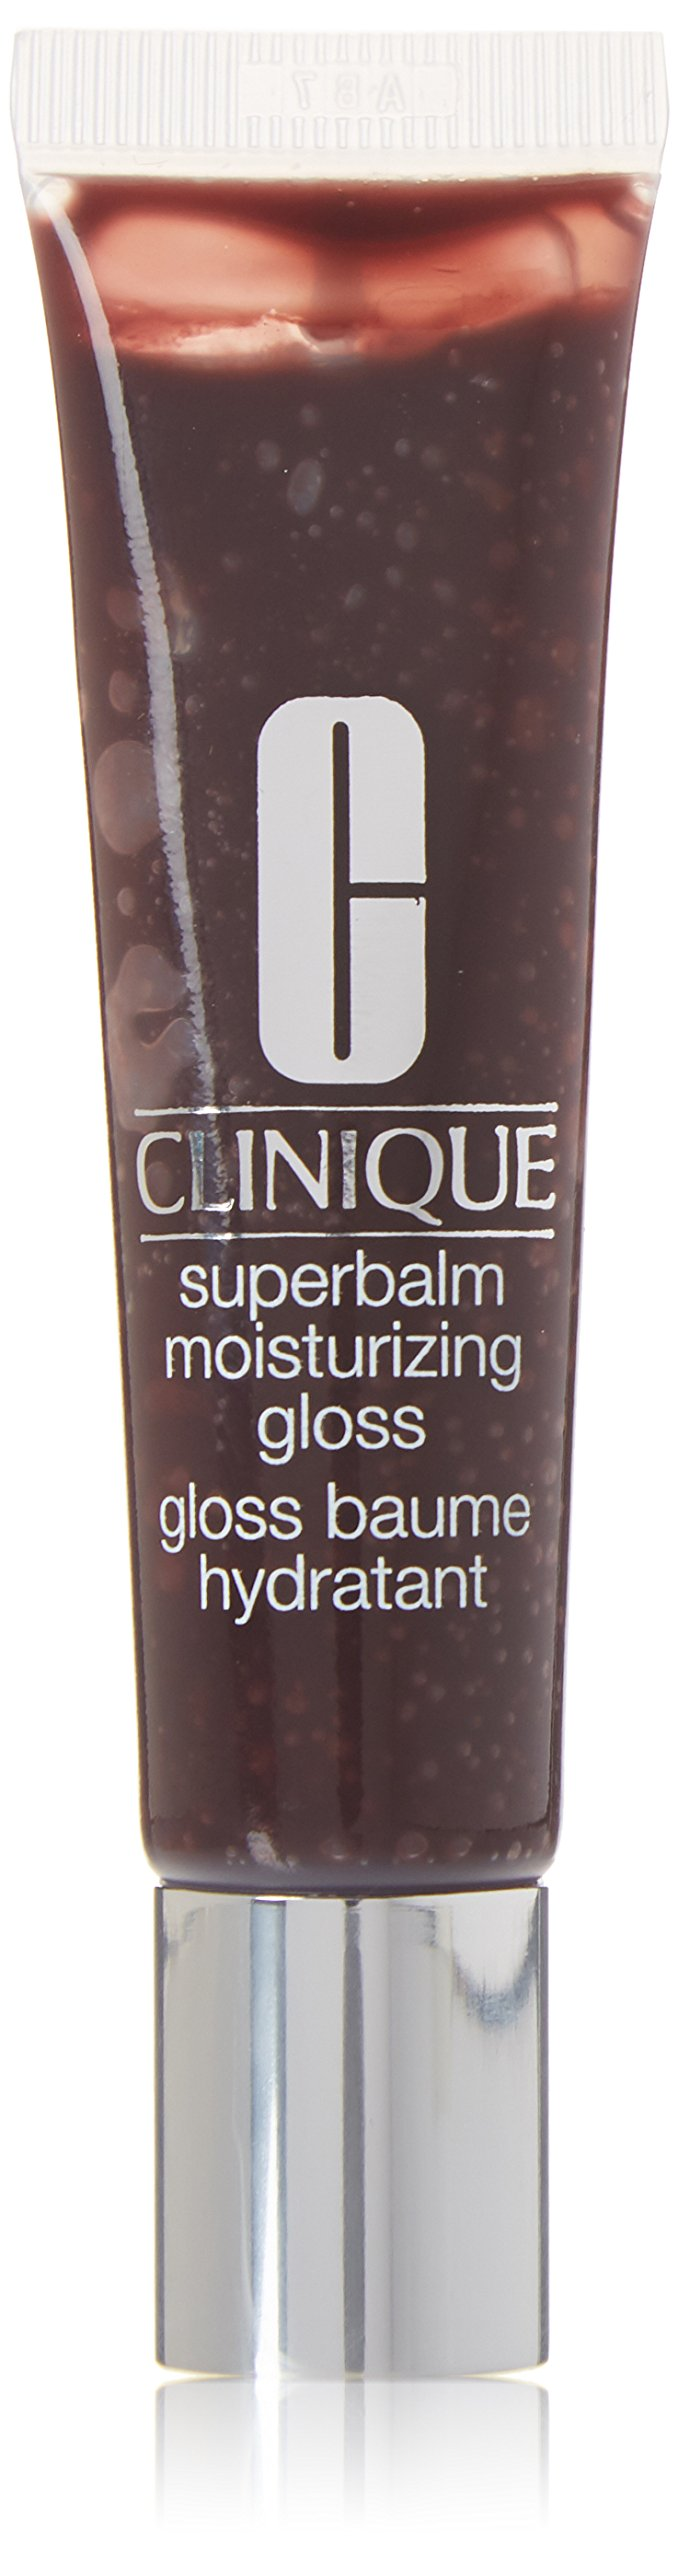 Clinique Superbalm Moisturizing Gloss 16 Black Honey by Clinique (Image #1)